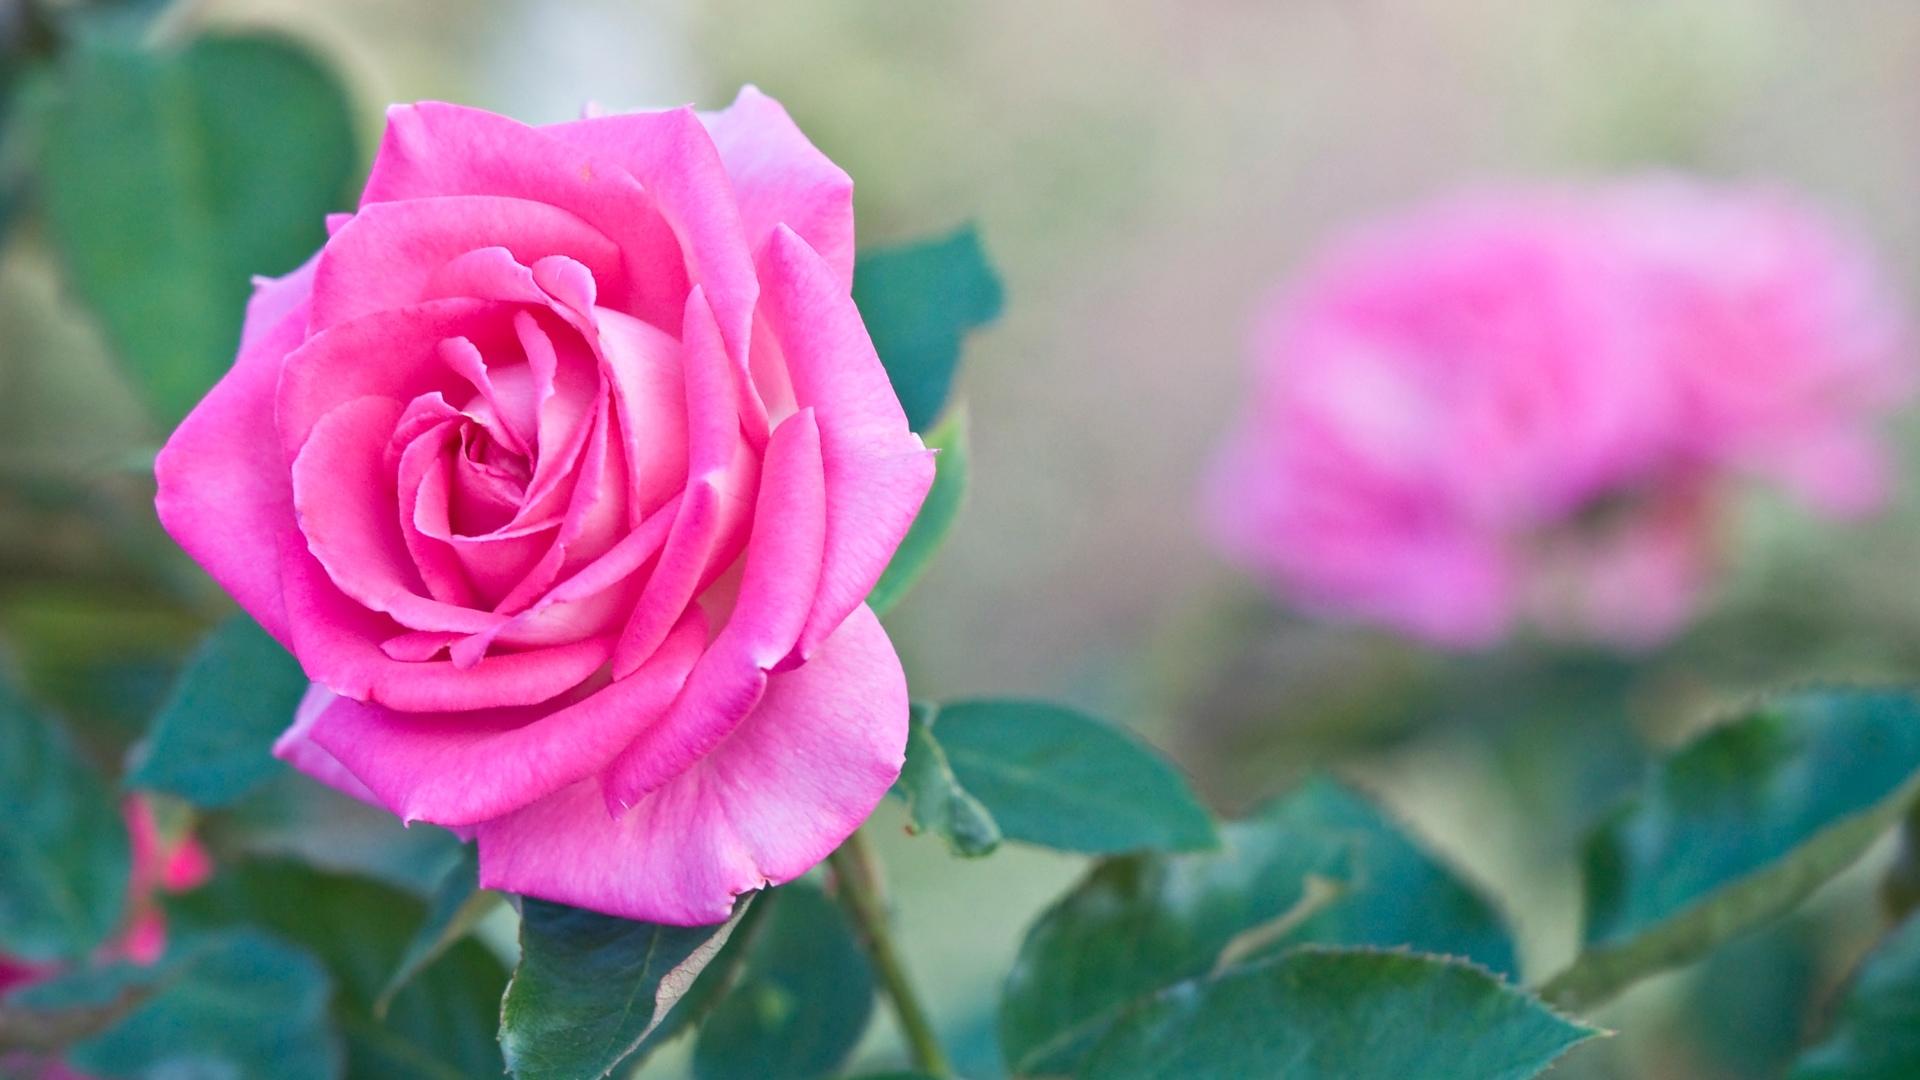 Fondos de flores wallpapers hd gratis - Images of red roses hd ...